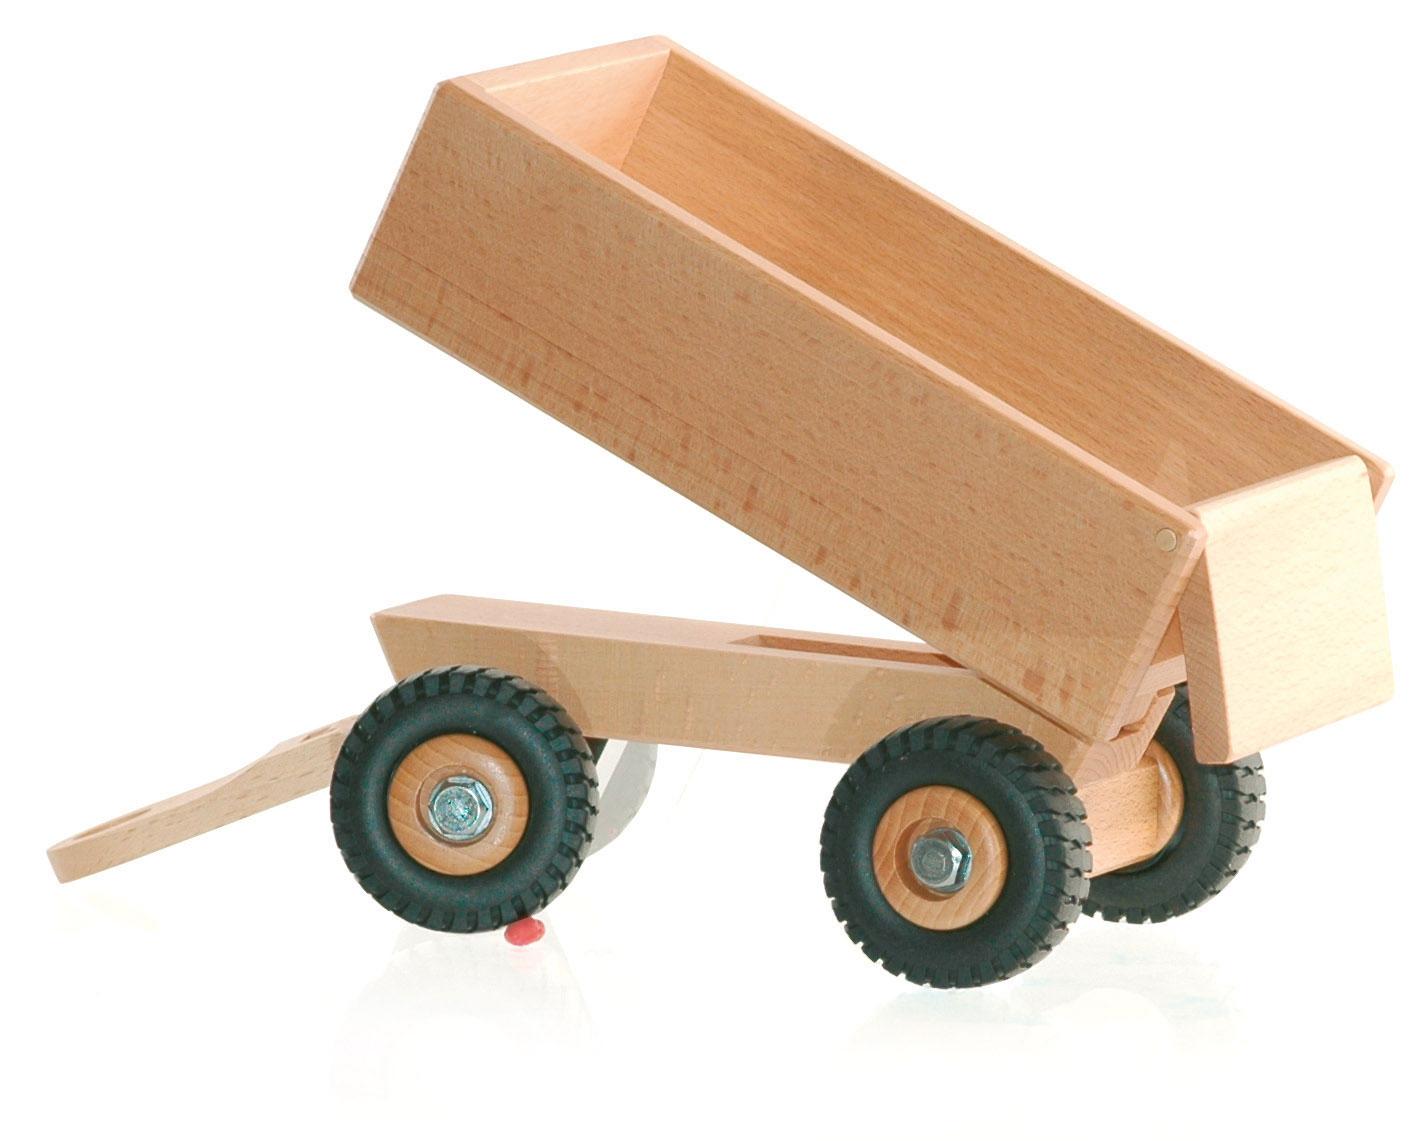 Bauernhof Ostheimer Traktor 5560040 Ostheimer Kipper für Traktor 5560046 Holzspielzeug